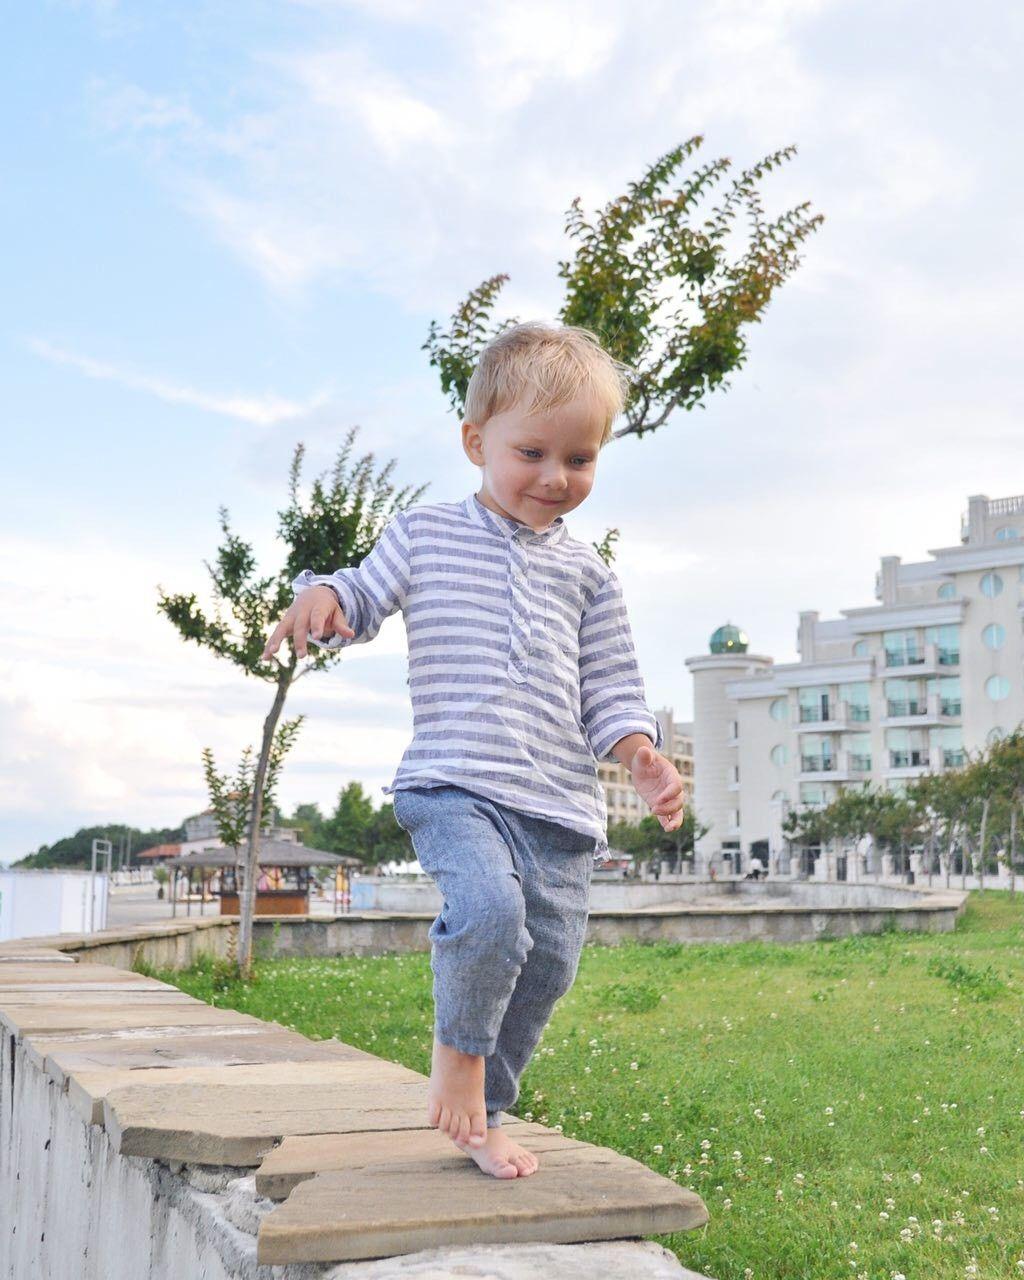 87178e898 Boys Linen Long Sleeve Shirt - Boys Blue-White Striped Shirt - Boys Dress  Shirt - Boys Mandarin Collar Shirt - Toddler Boy Pearl Snaps Shirt